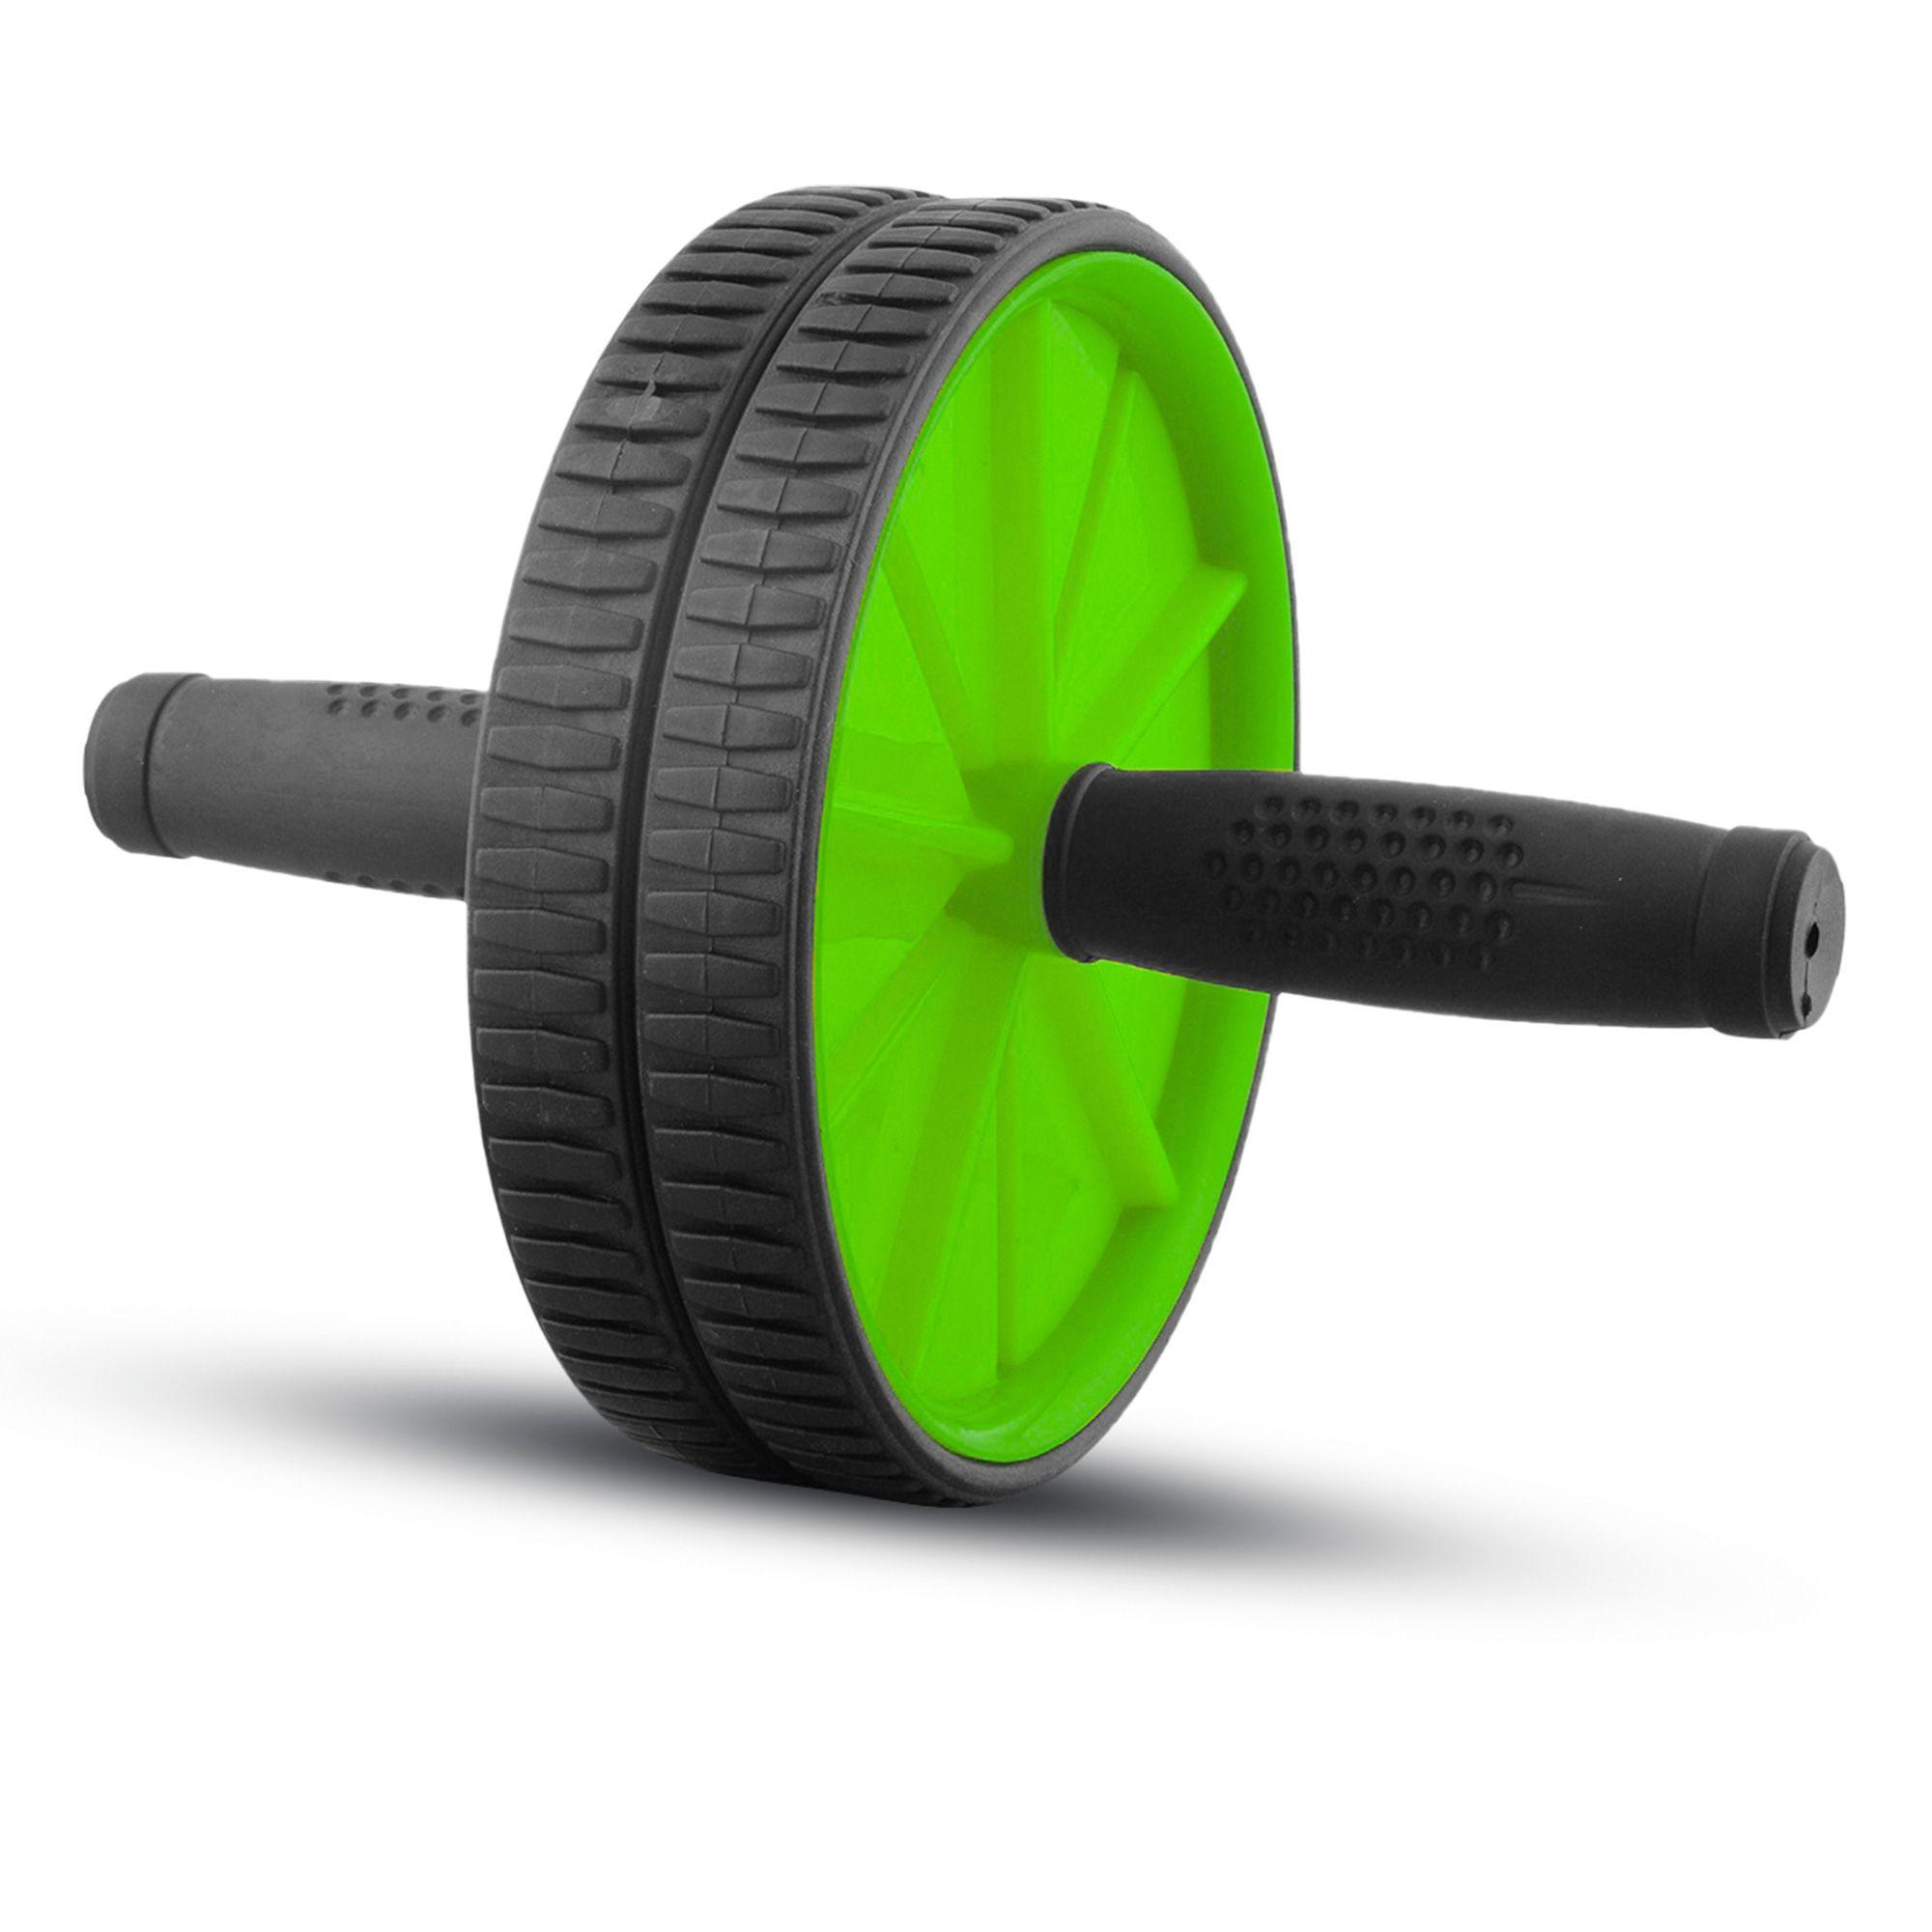 Roda Abdominal Wheel Stability 09076